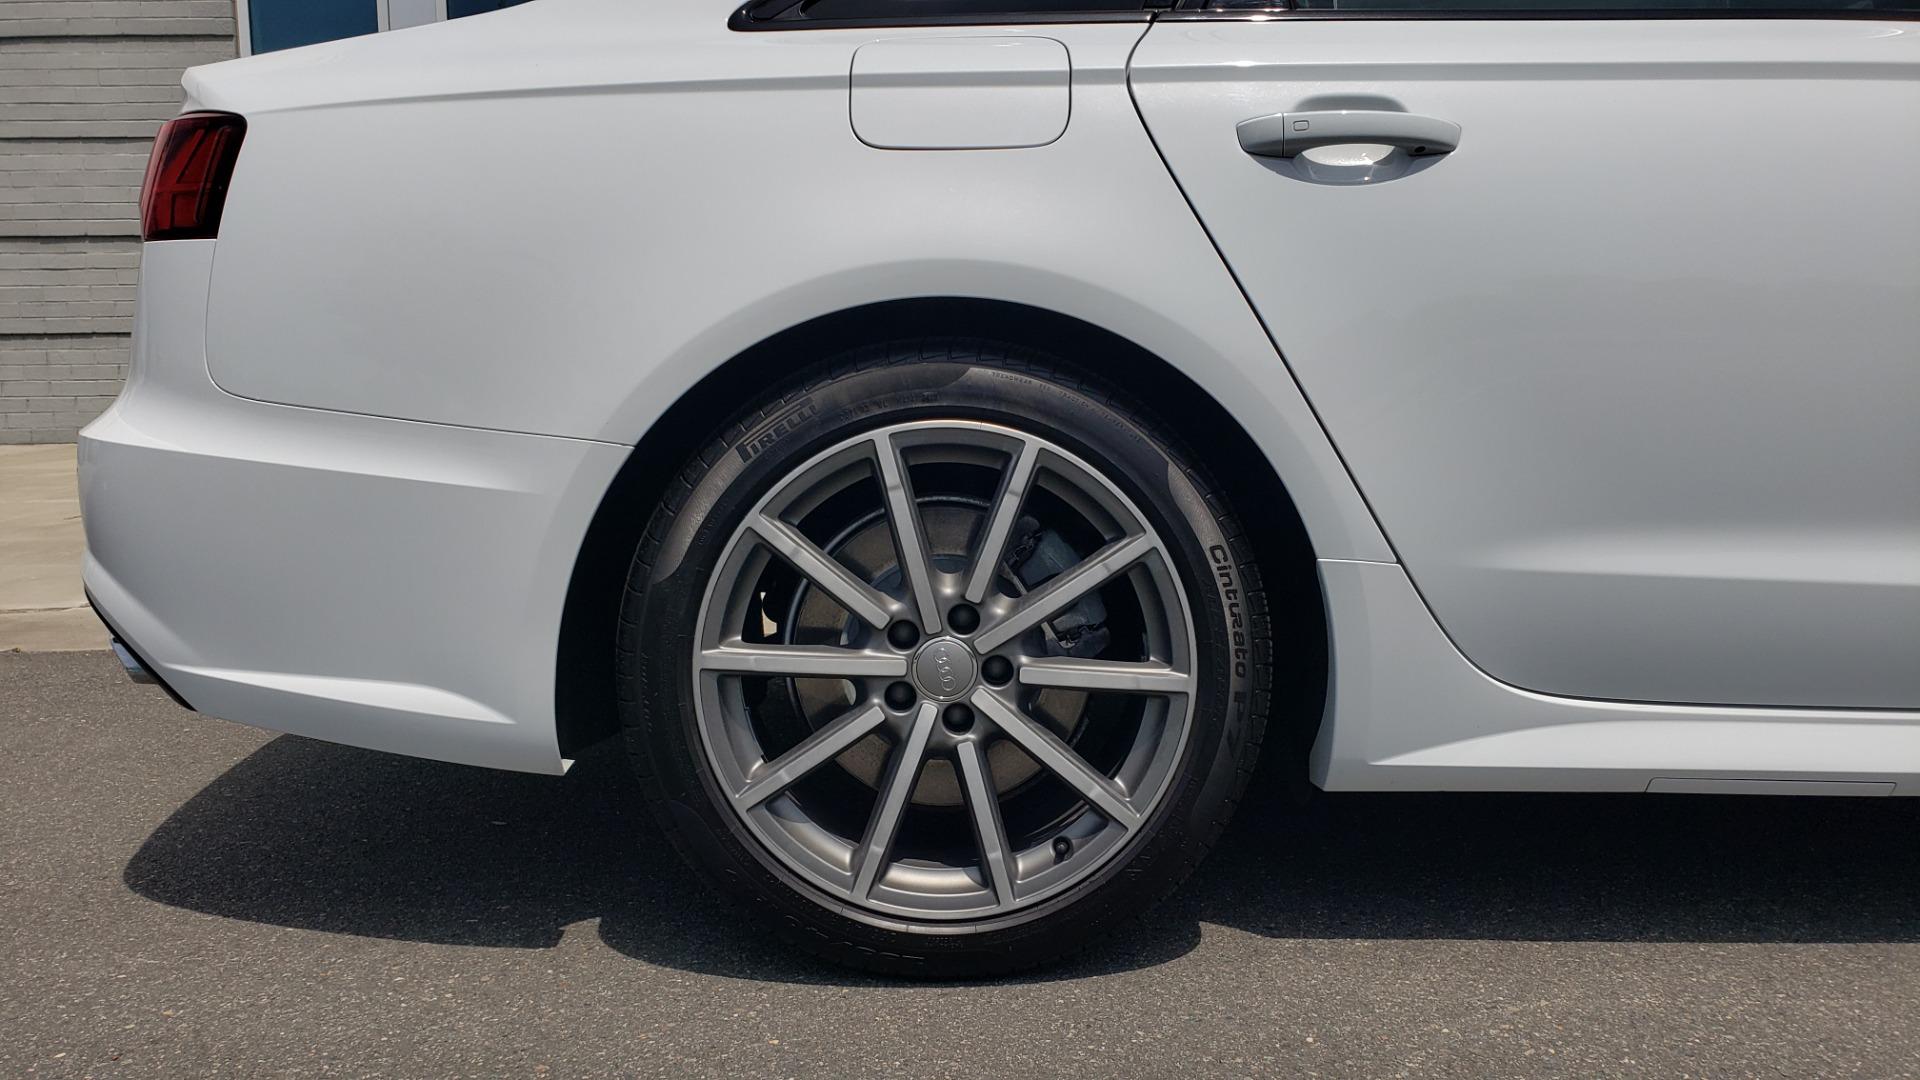 Used 2017 Audi A6 PRESTIGE SEDAN 3.0T / NAV / SUNROOF / BLACK OPTIC / CLD WTHR / REARVIEW for sale $30,797 at Formula Imports in Charlotte NC 28227 84